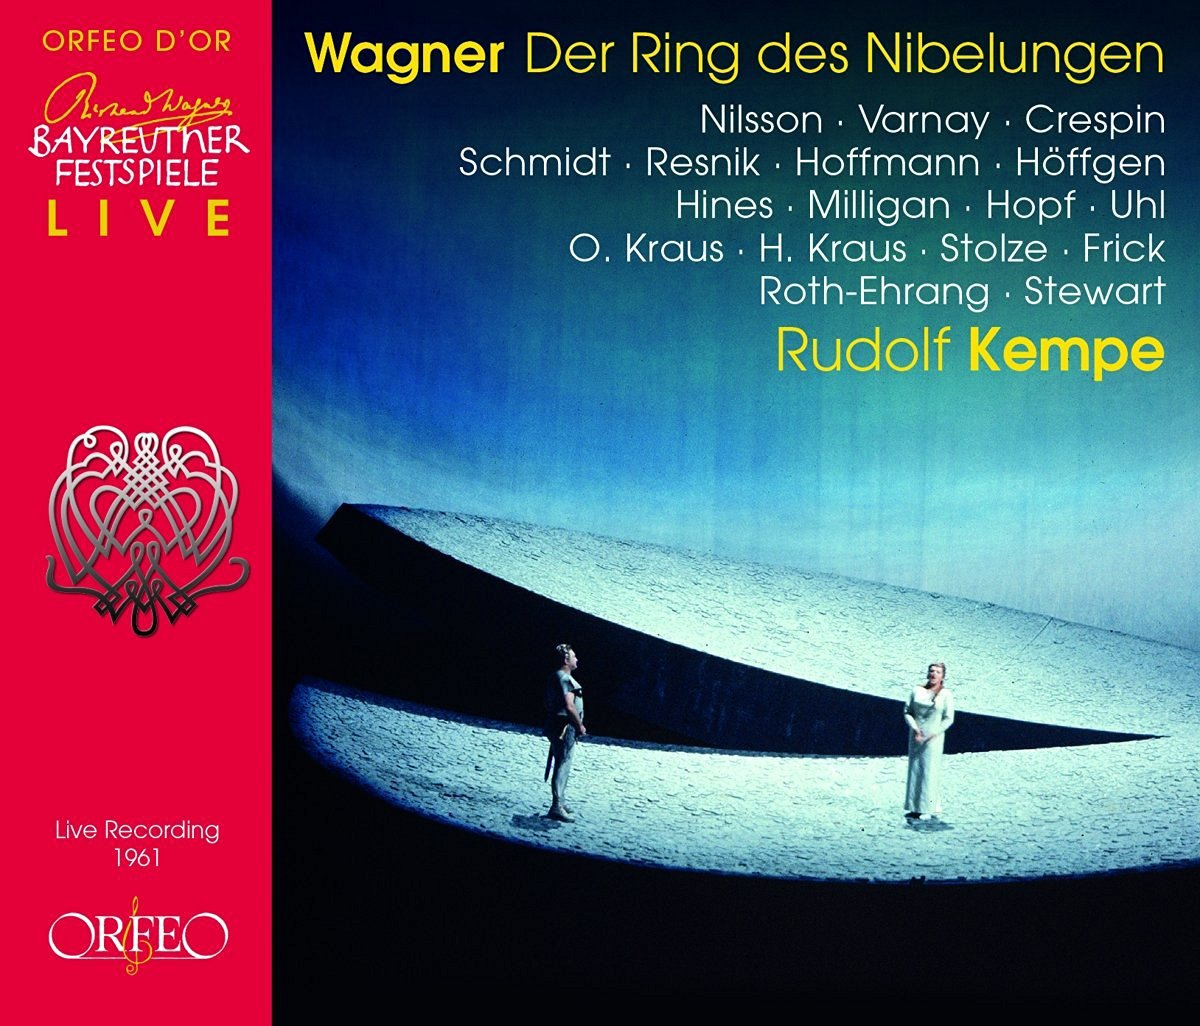 Wagner. Discografía completa 71Pm-o4ObyL._SL1200_